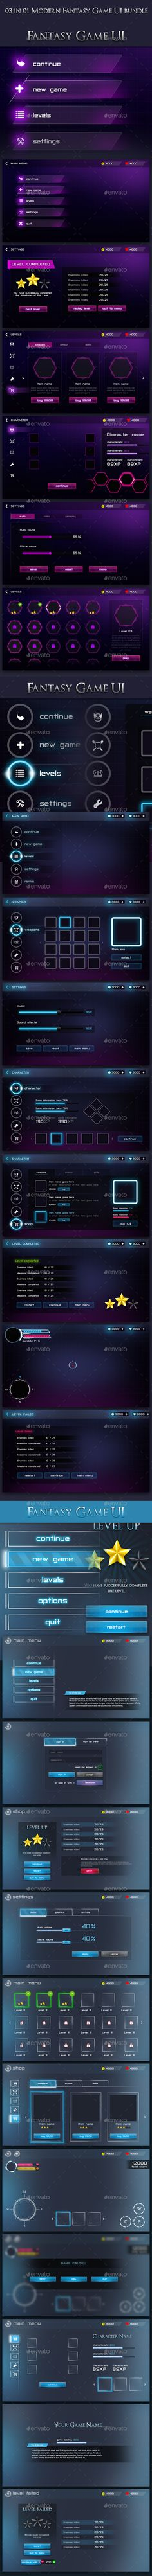 03 in 01 Modern Fantasy Game UI Bundle - User Interfaces Game Assets